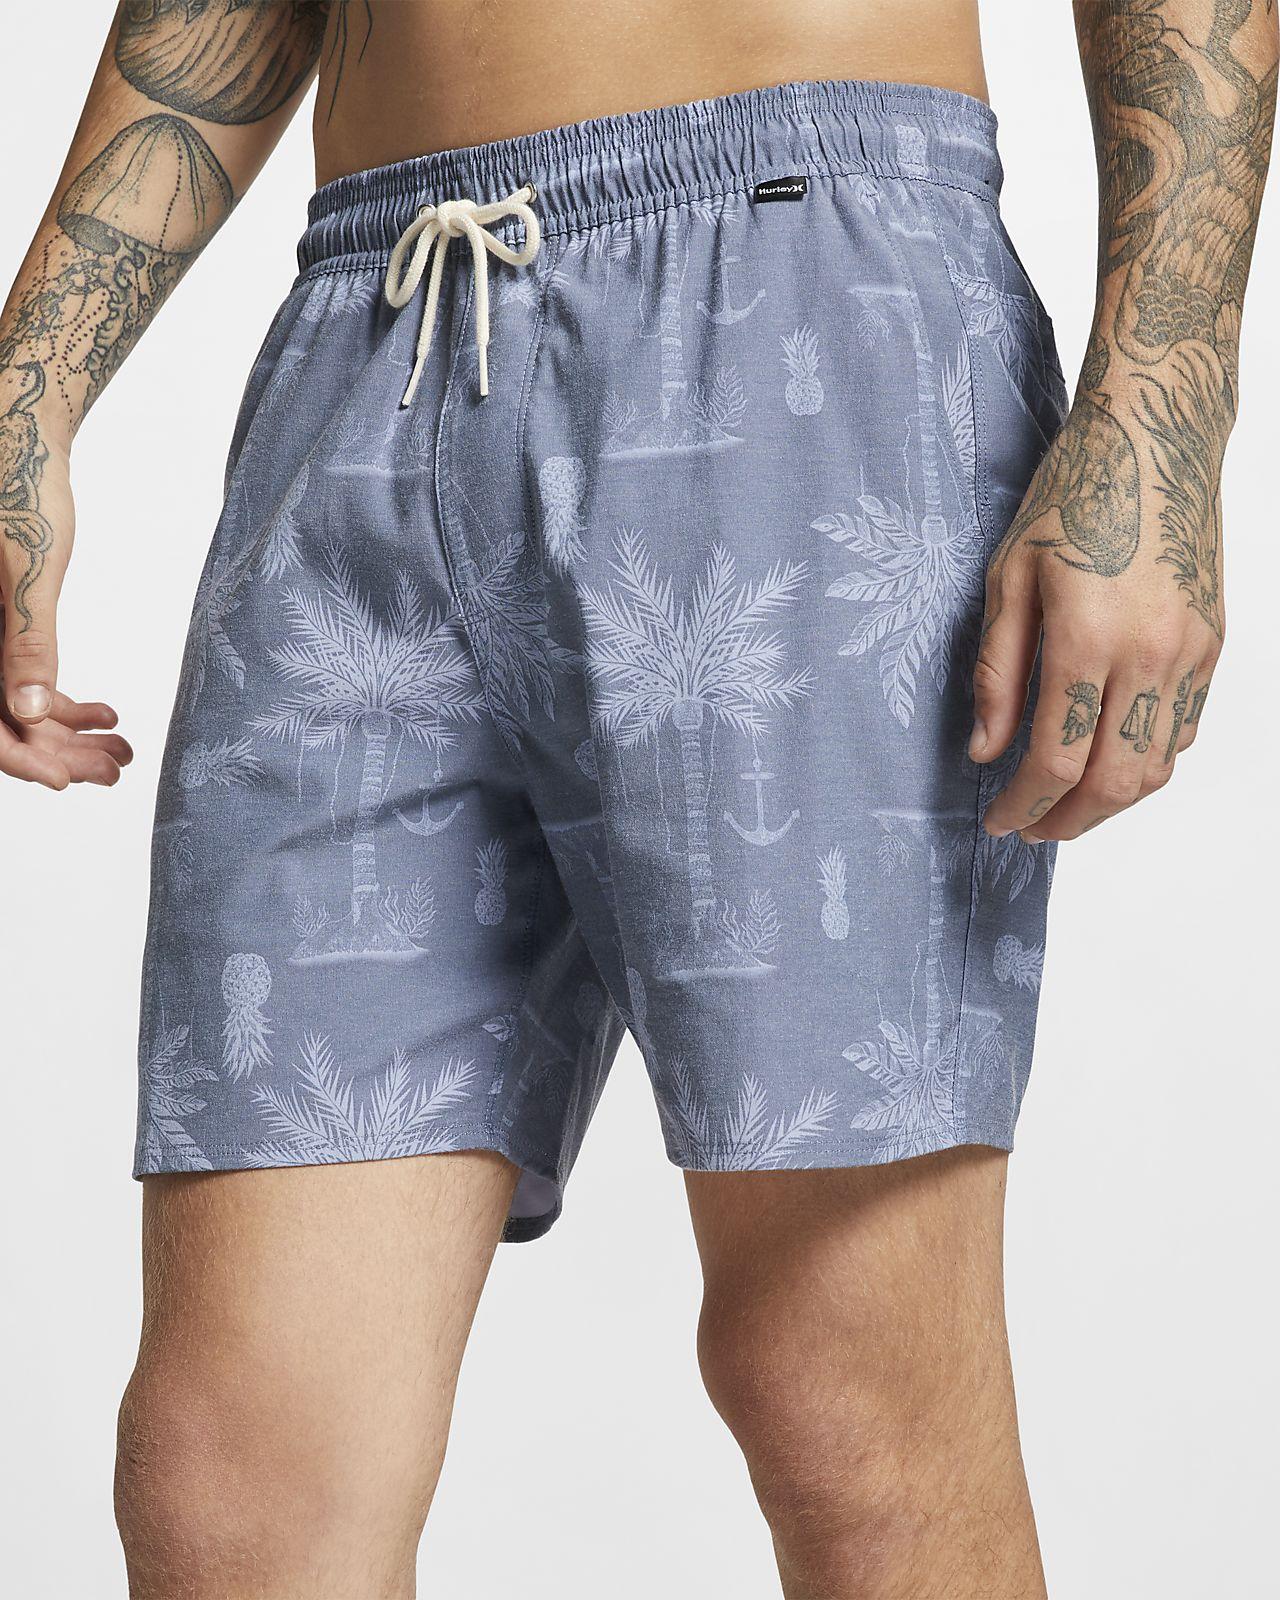 Hurley Asylum Volley Pantalón corto de 43 cm - Hombre